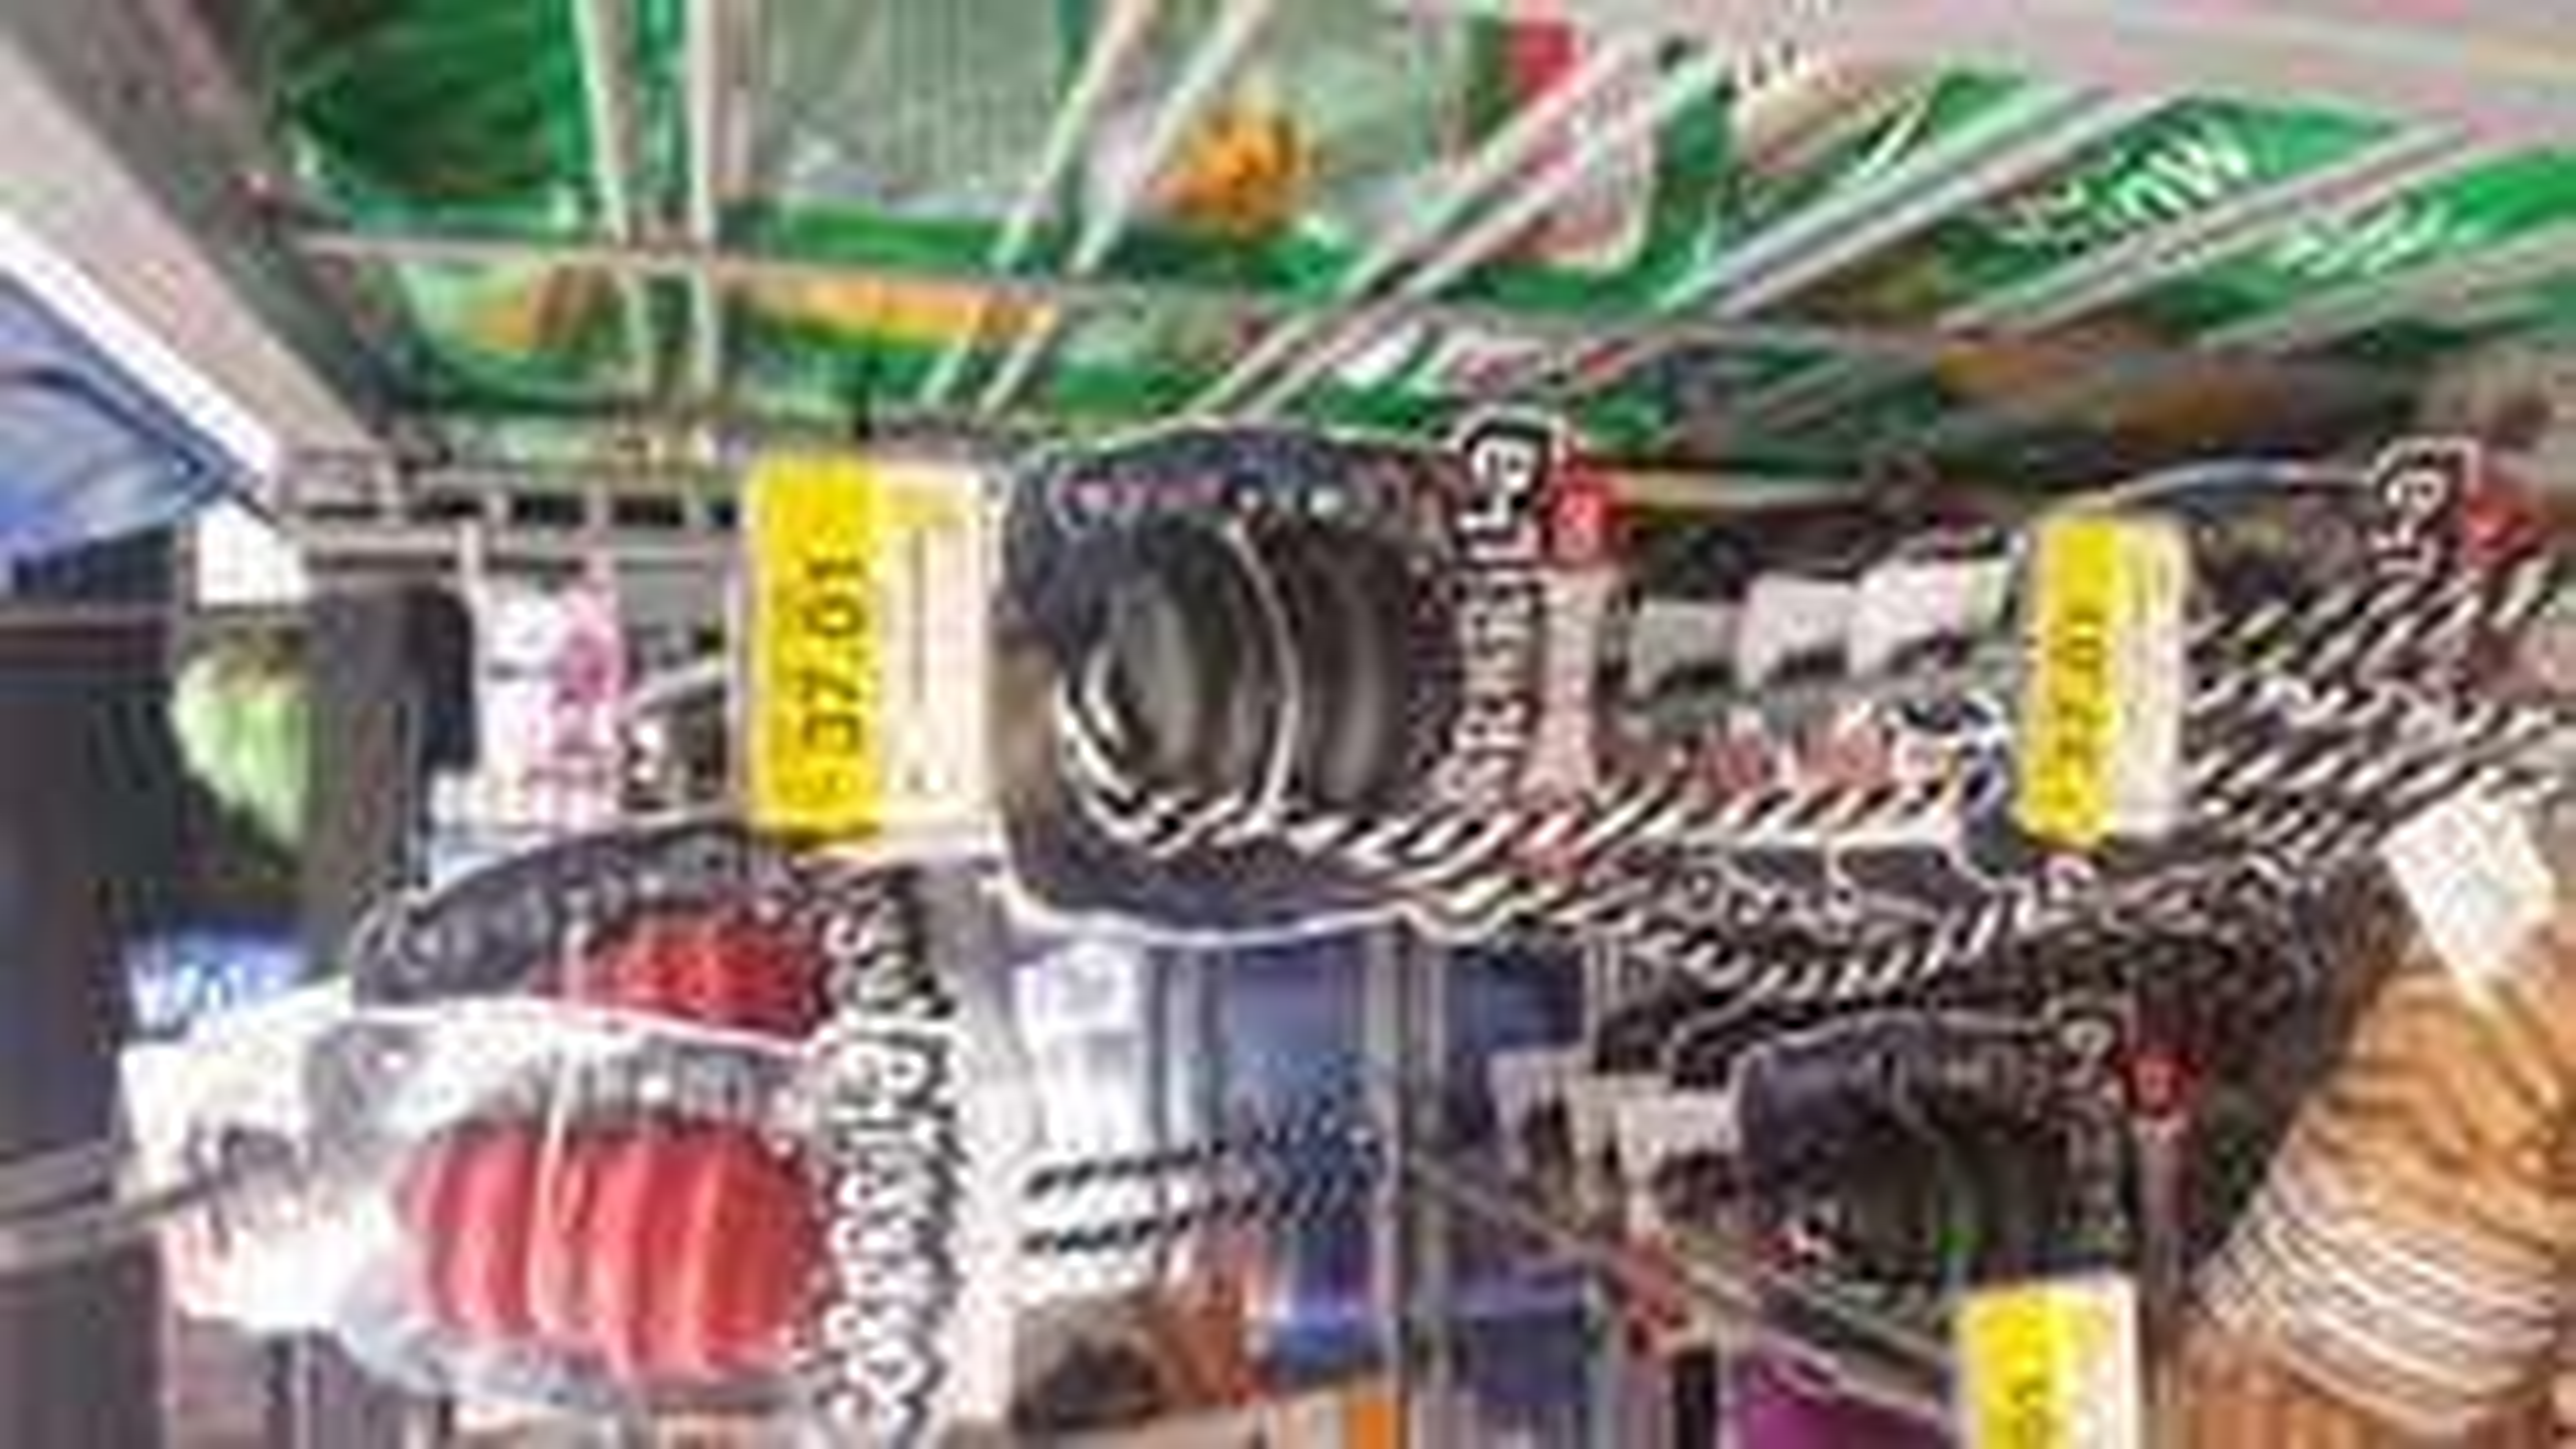 Walmart: Gorrrrilla tug o war juguete para perro